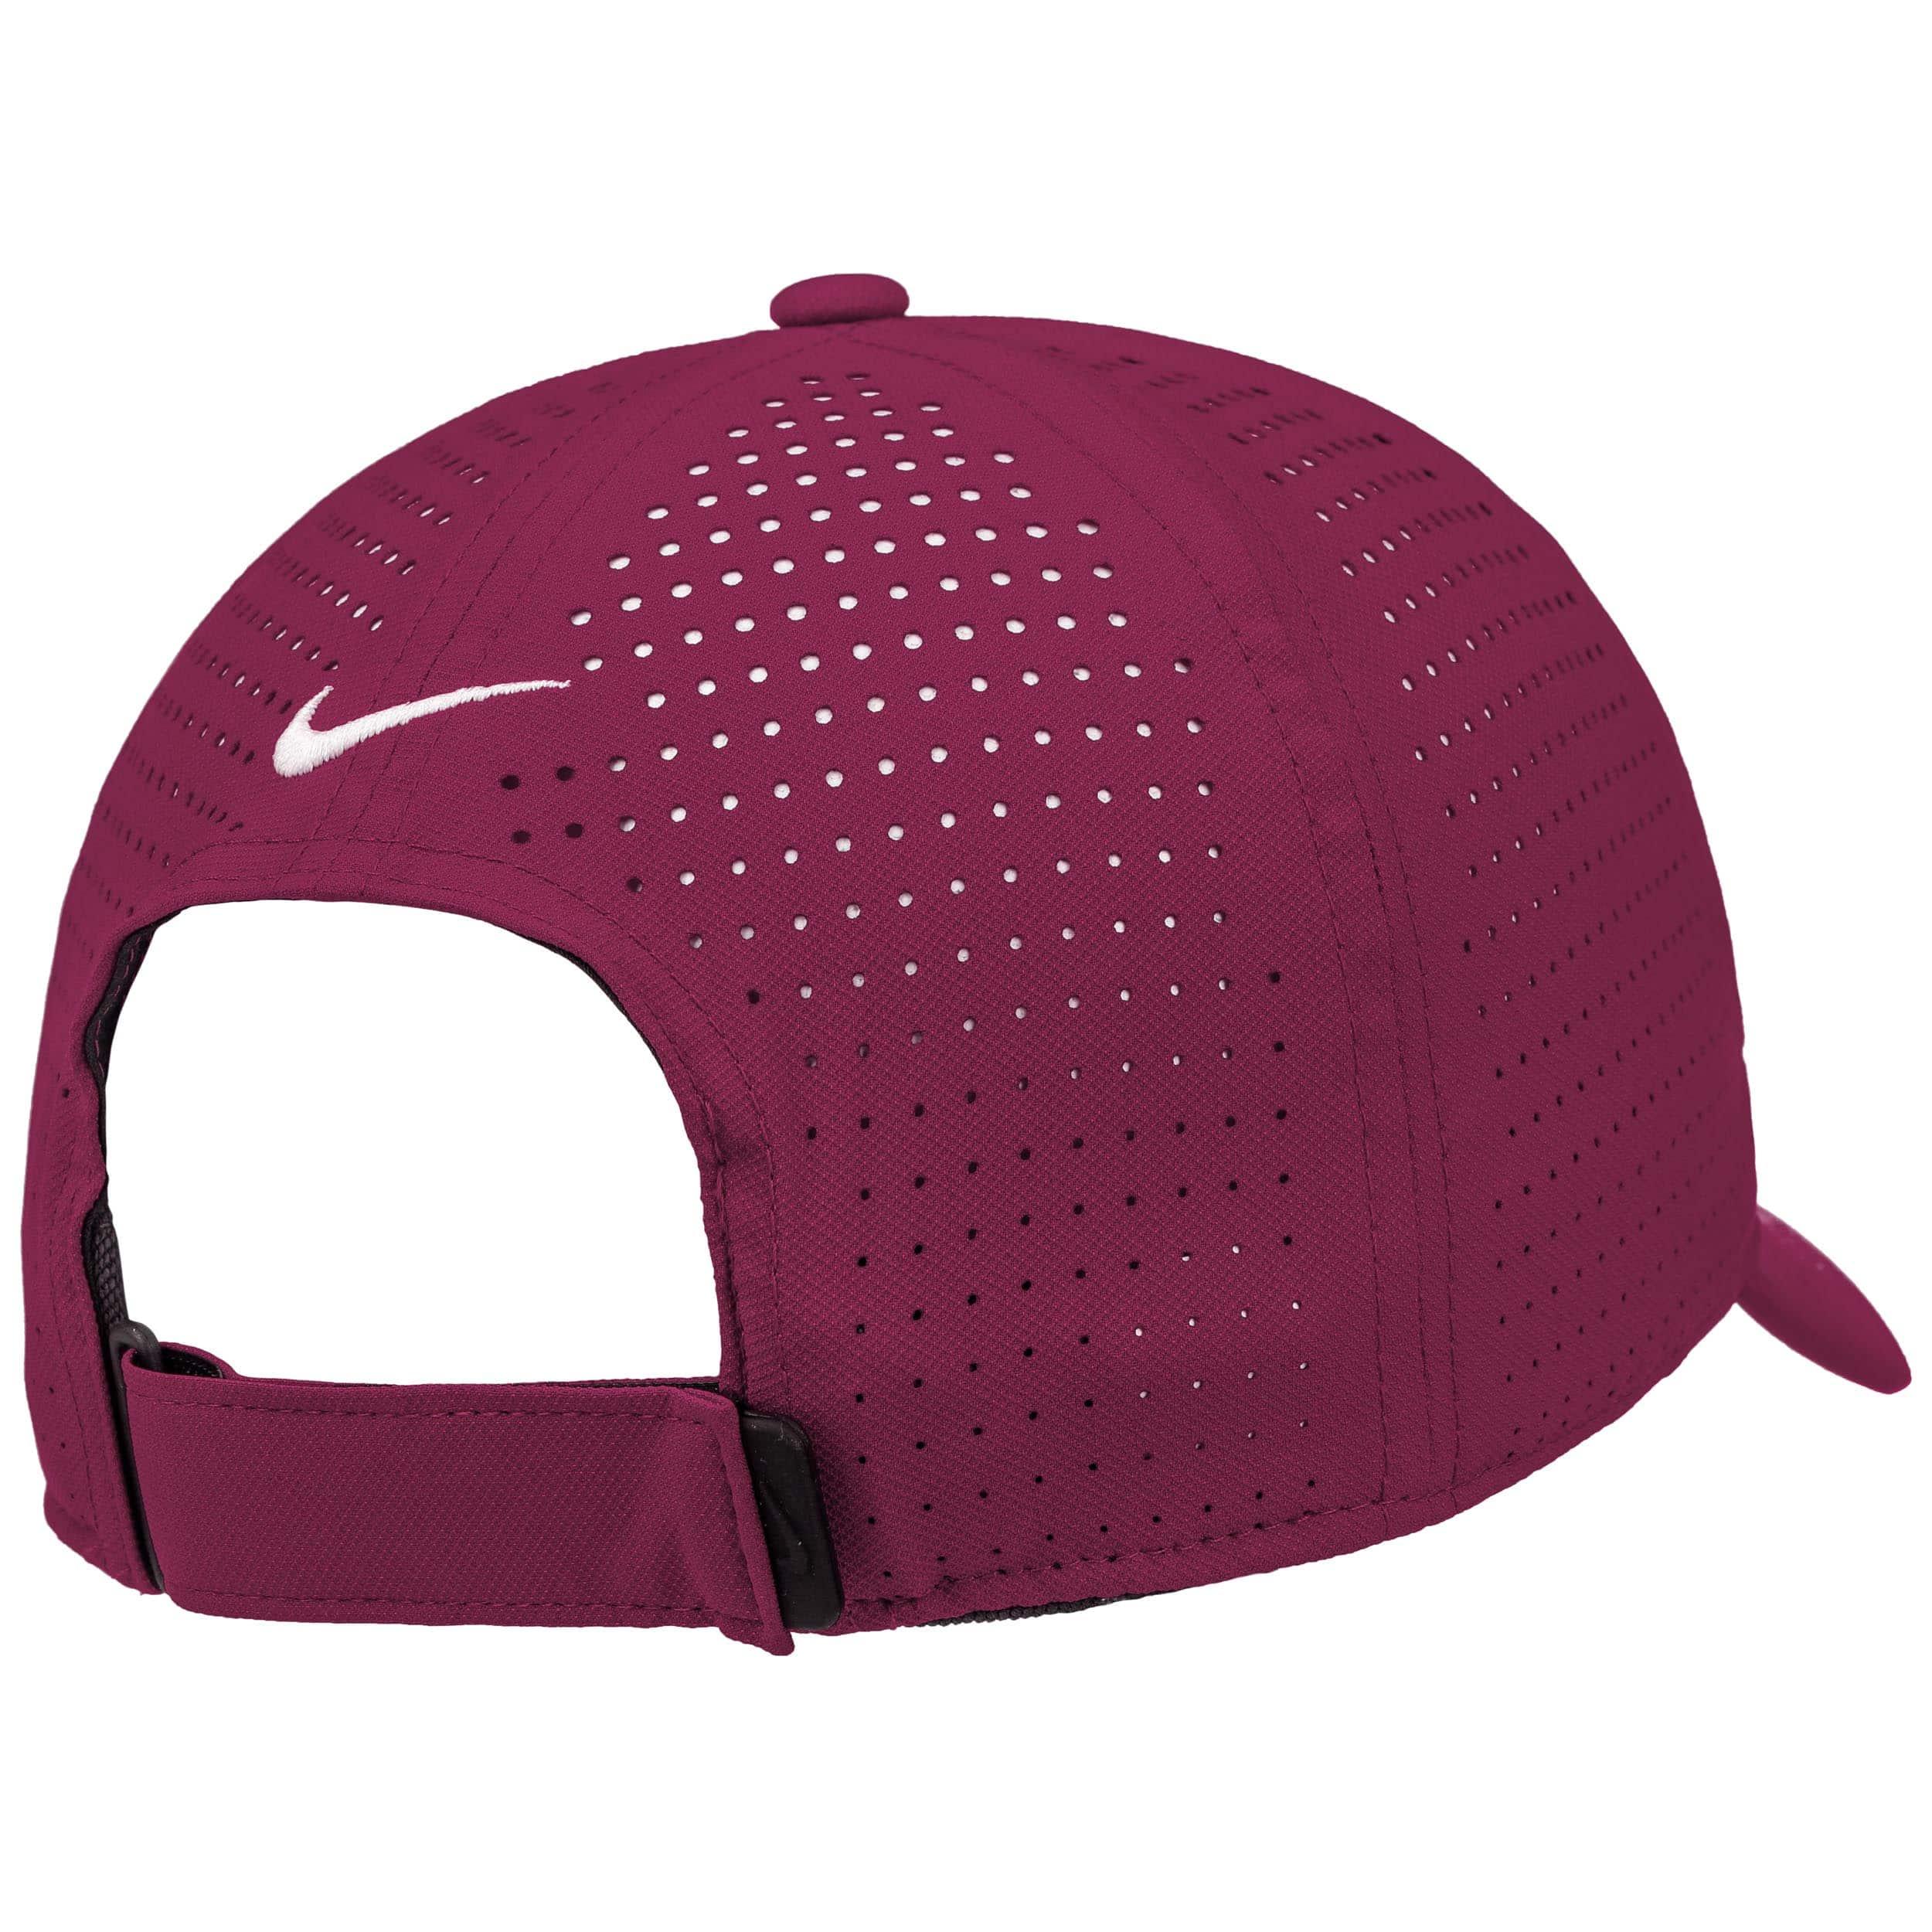 Gorra Legacy 91 Perf Strapback by Nike - Gorras - sombreroshop.es 3550400129f